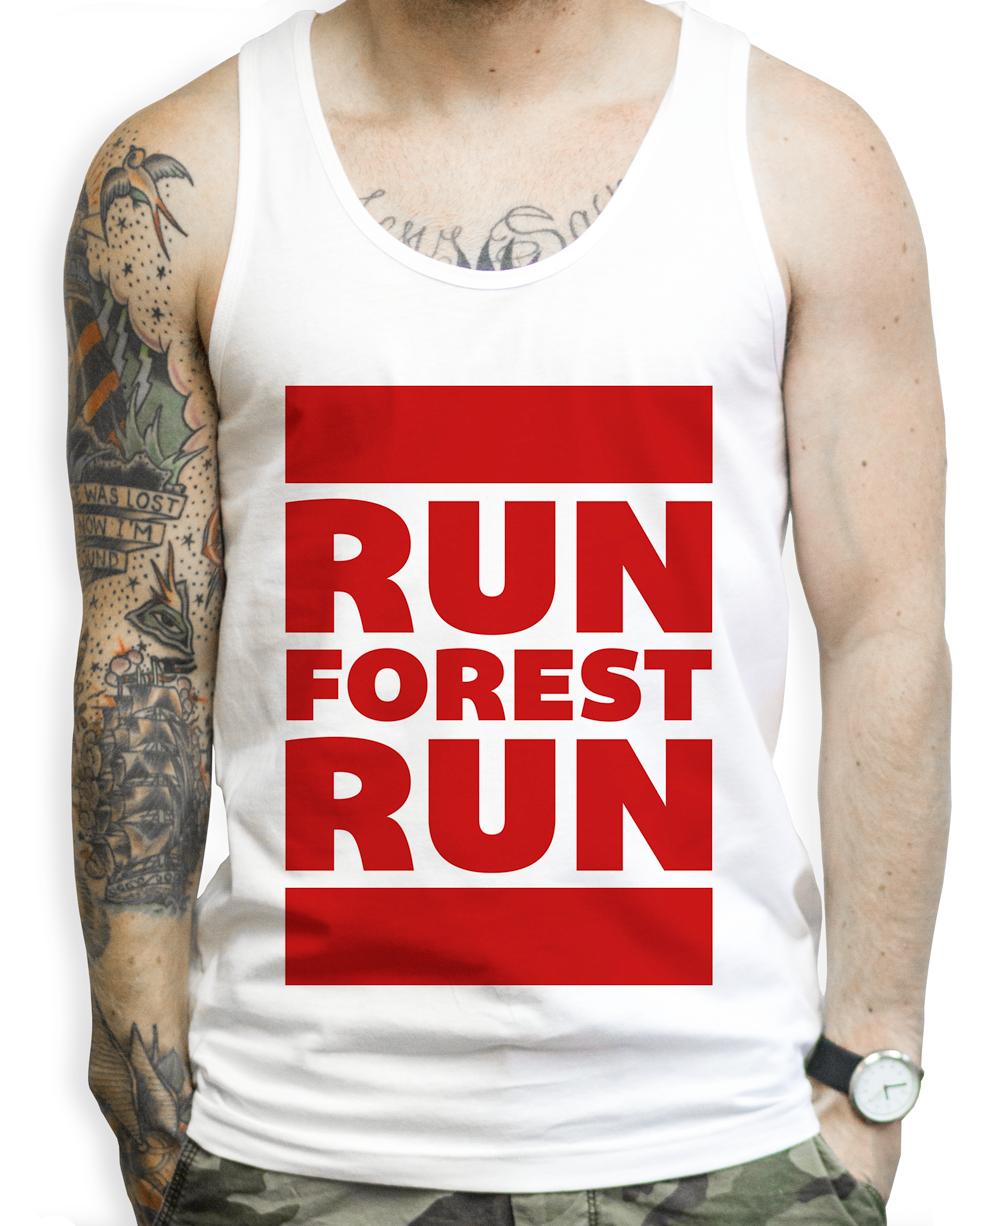 c9d0befb54a00 Run Forest Run on a Unisex Tank Top